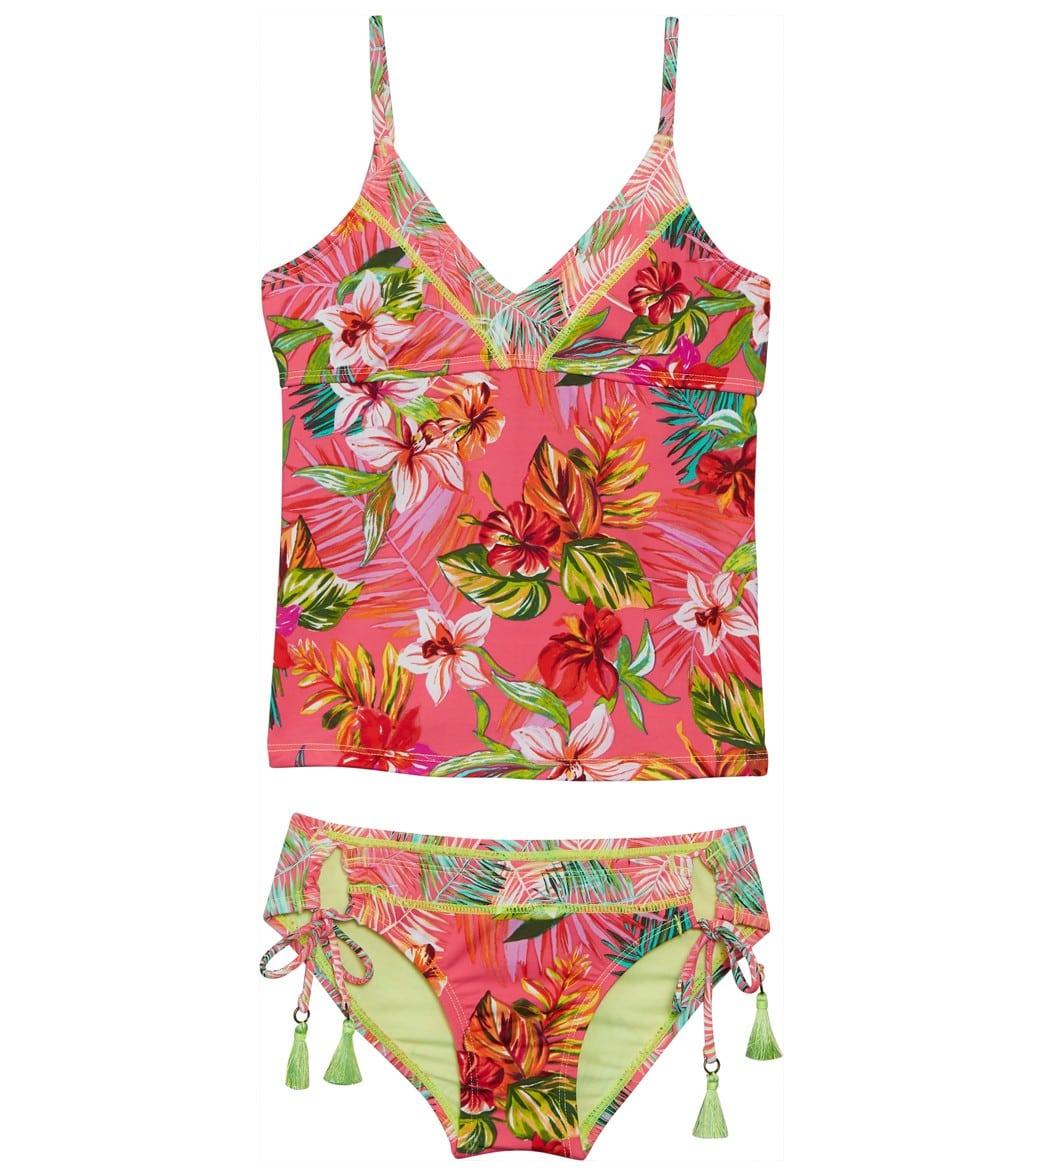 Hobie Girls' Hipster Setbig Or All Neck Flor V Adjustable Bikini Nothing Tankiniamp; Kid Pwkn0O8X